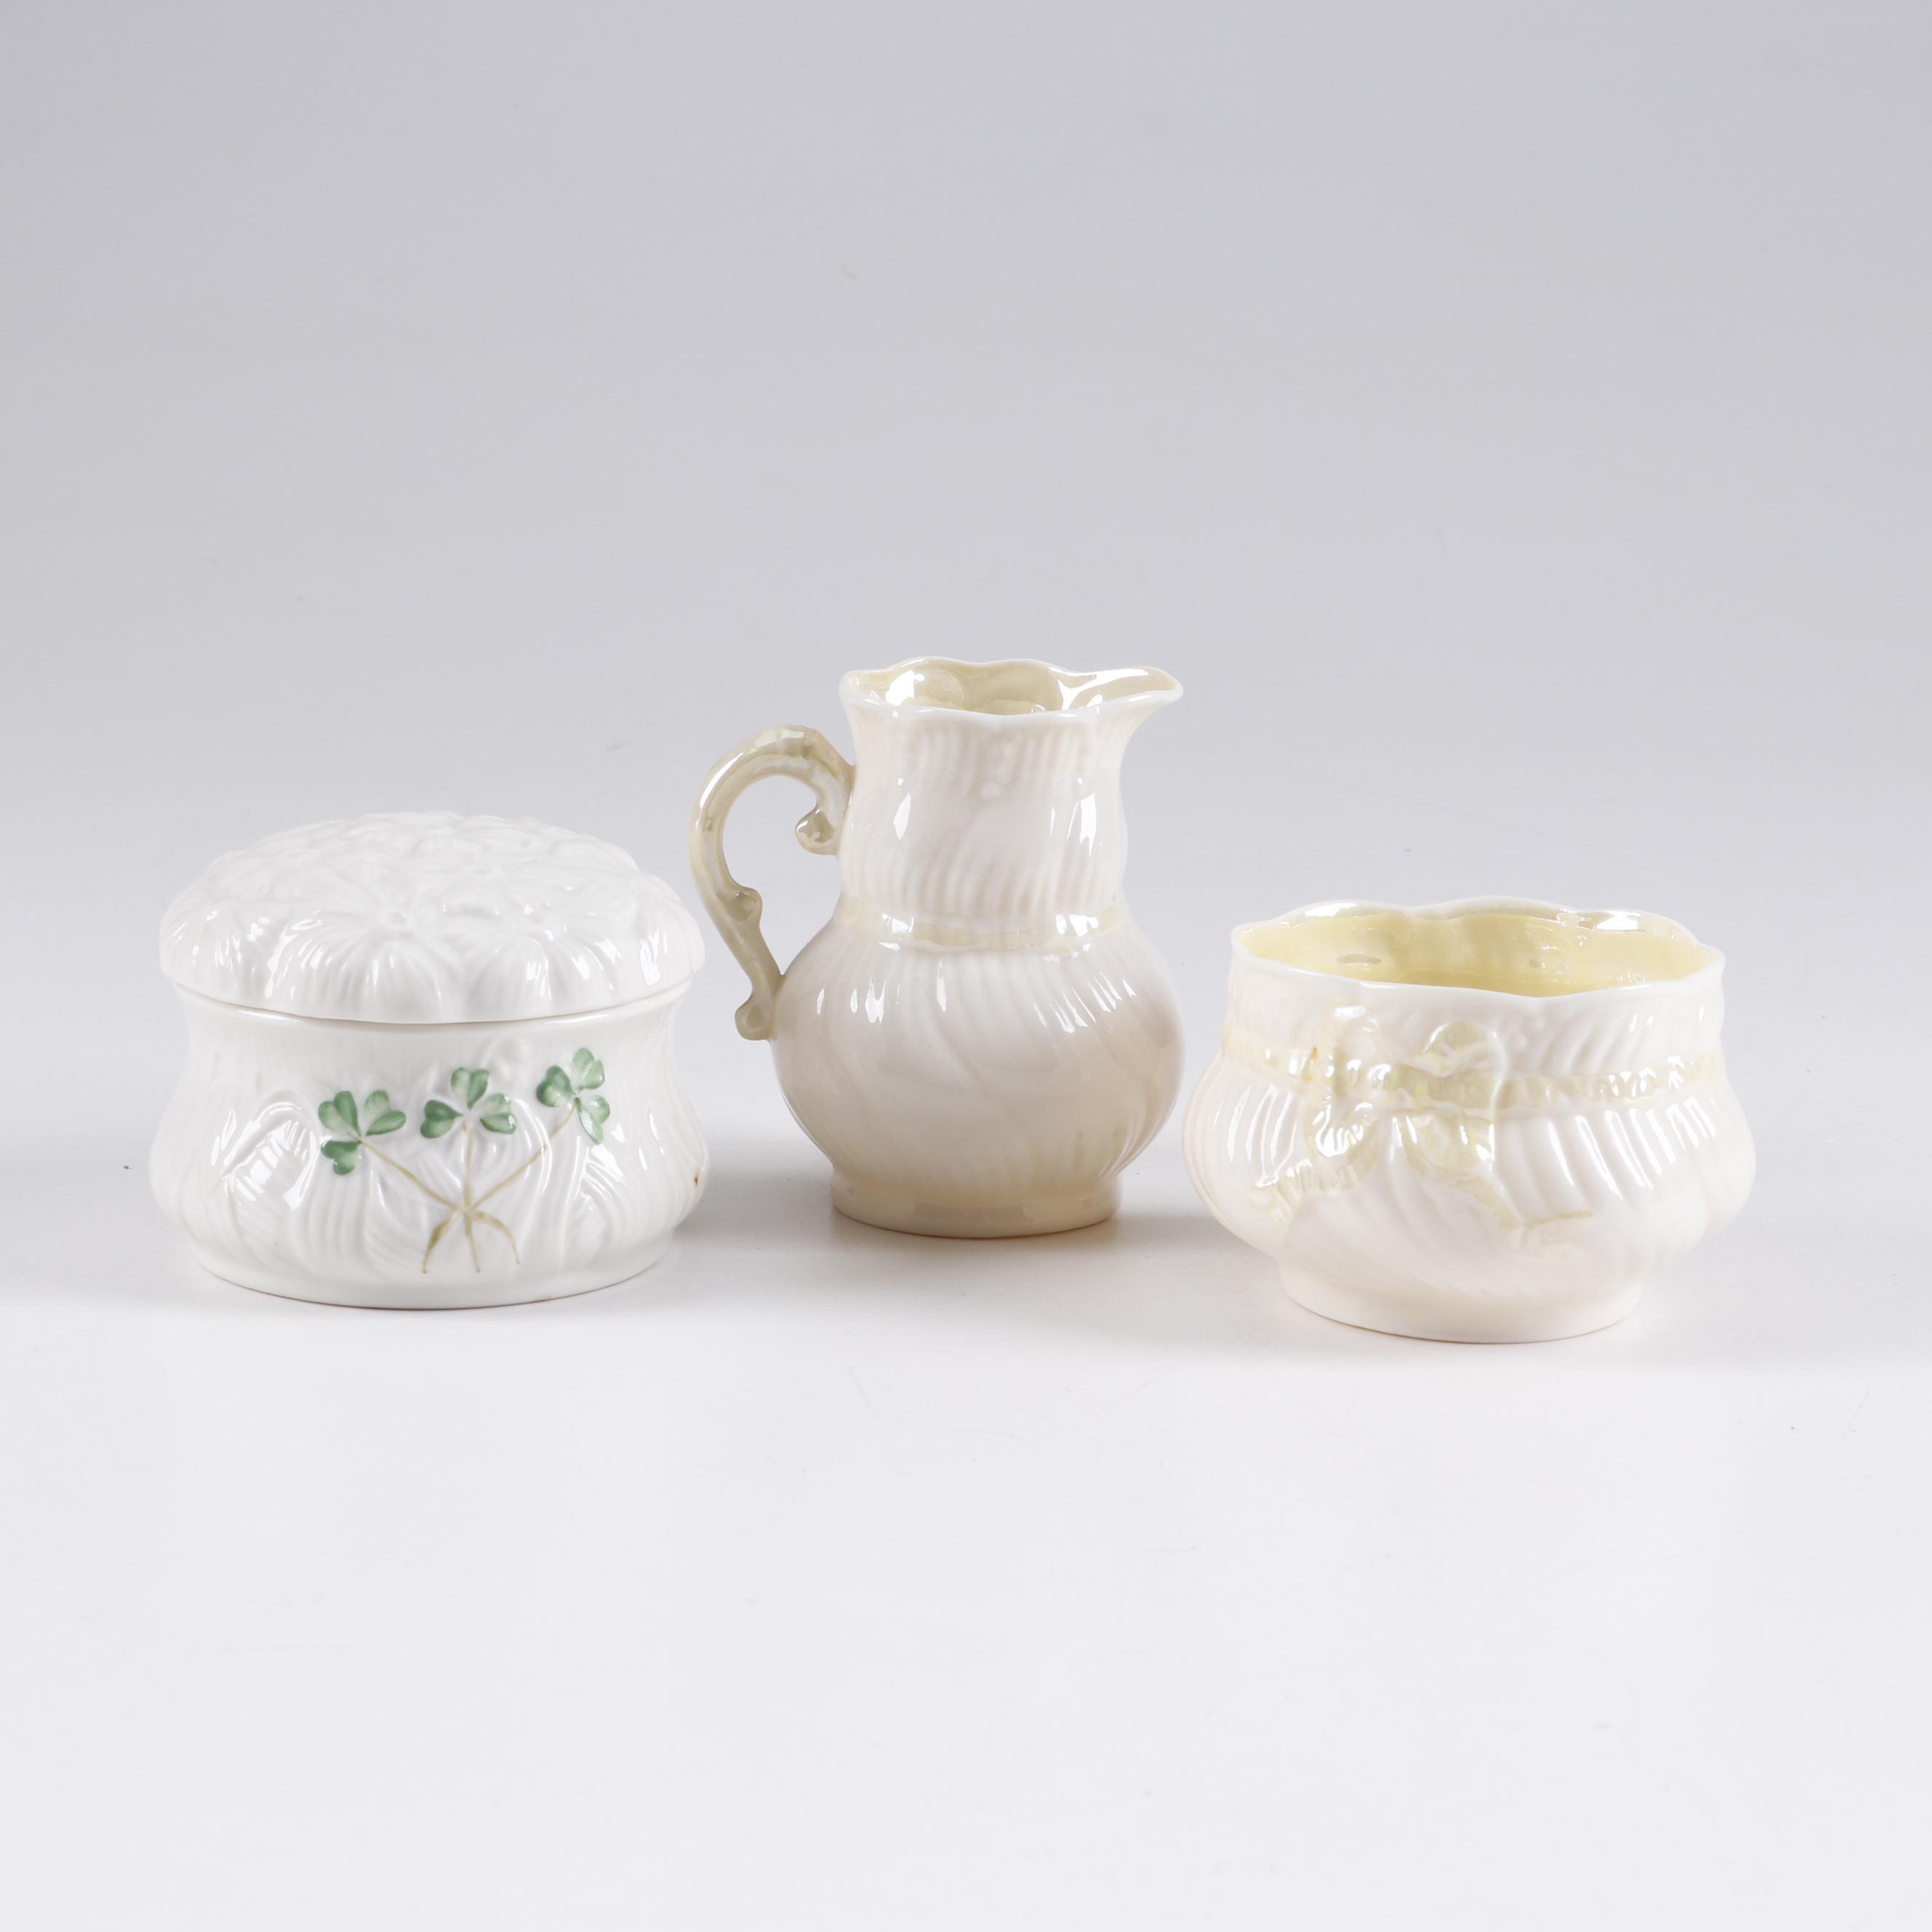 Beleek Porcelain Creamer, Sugar Bowl and Covered Dish